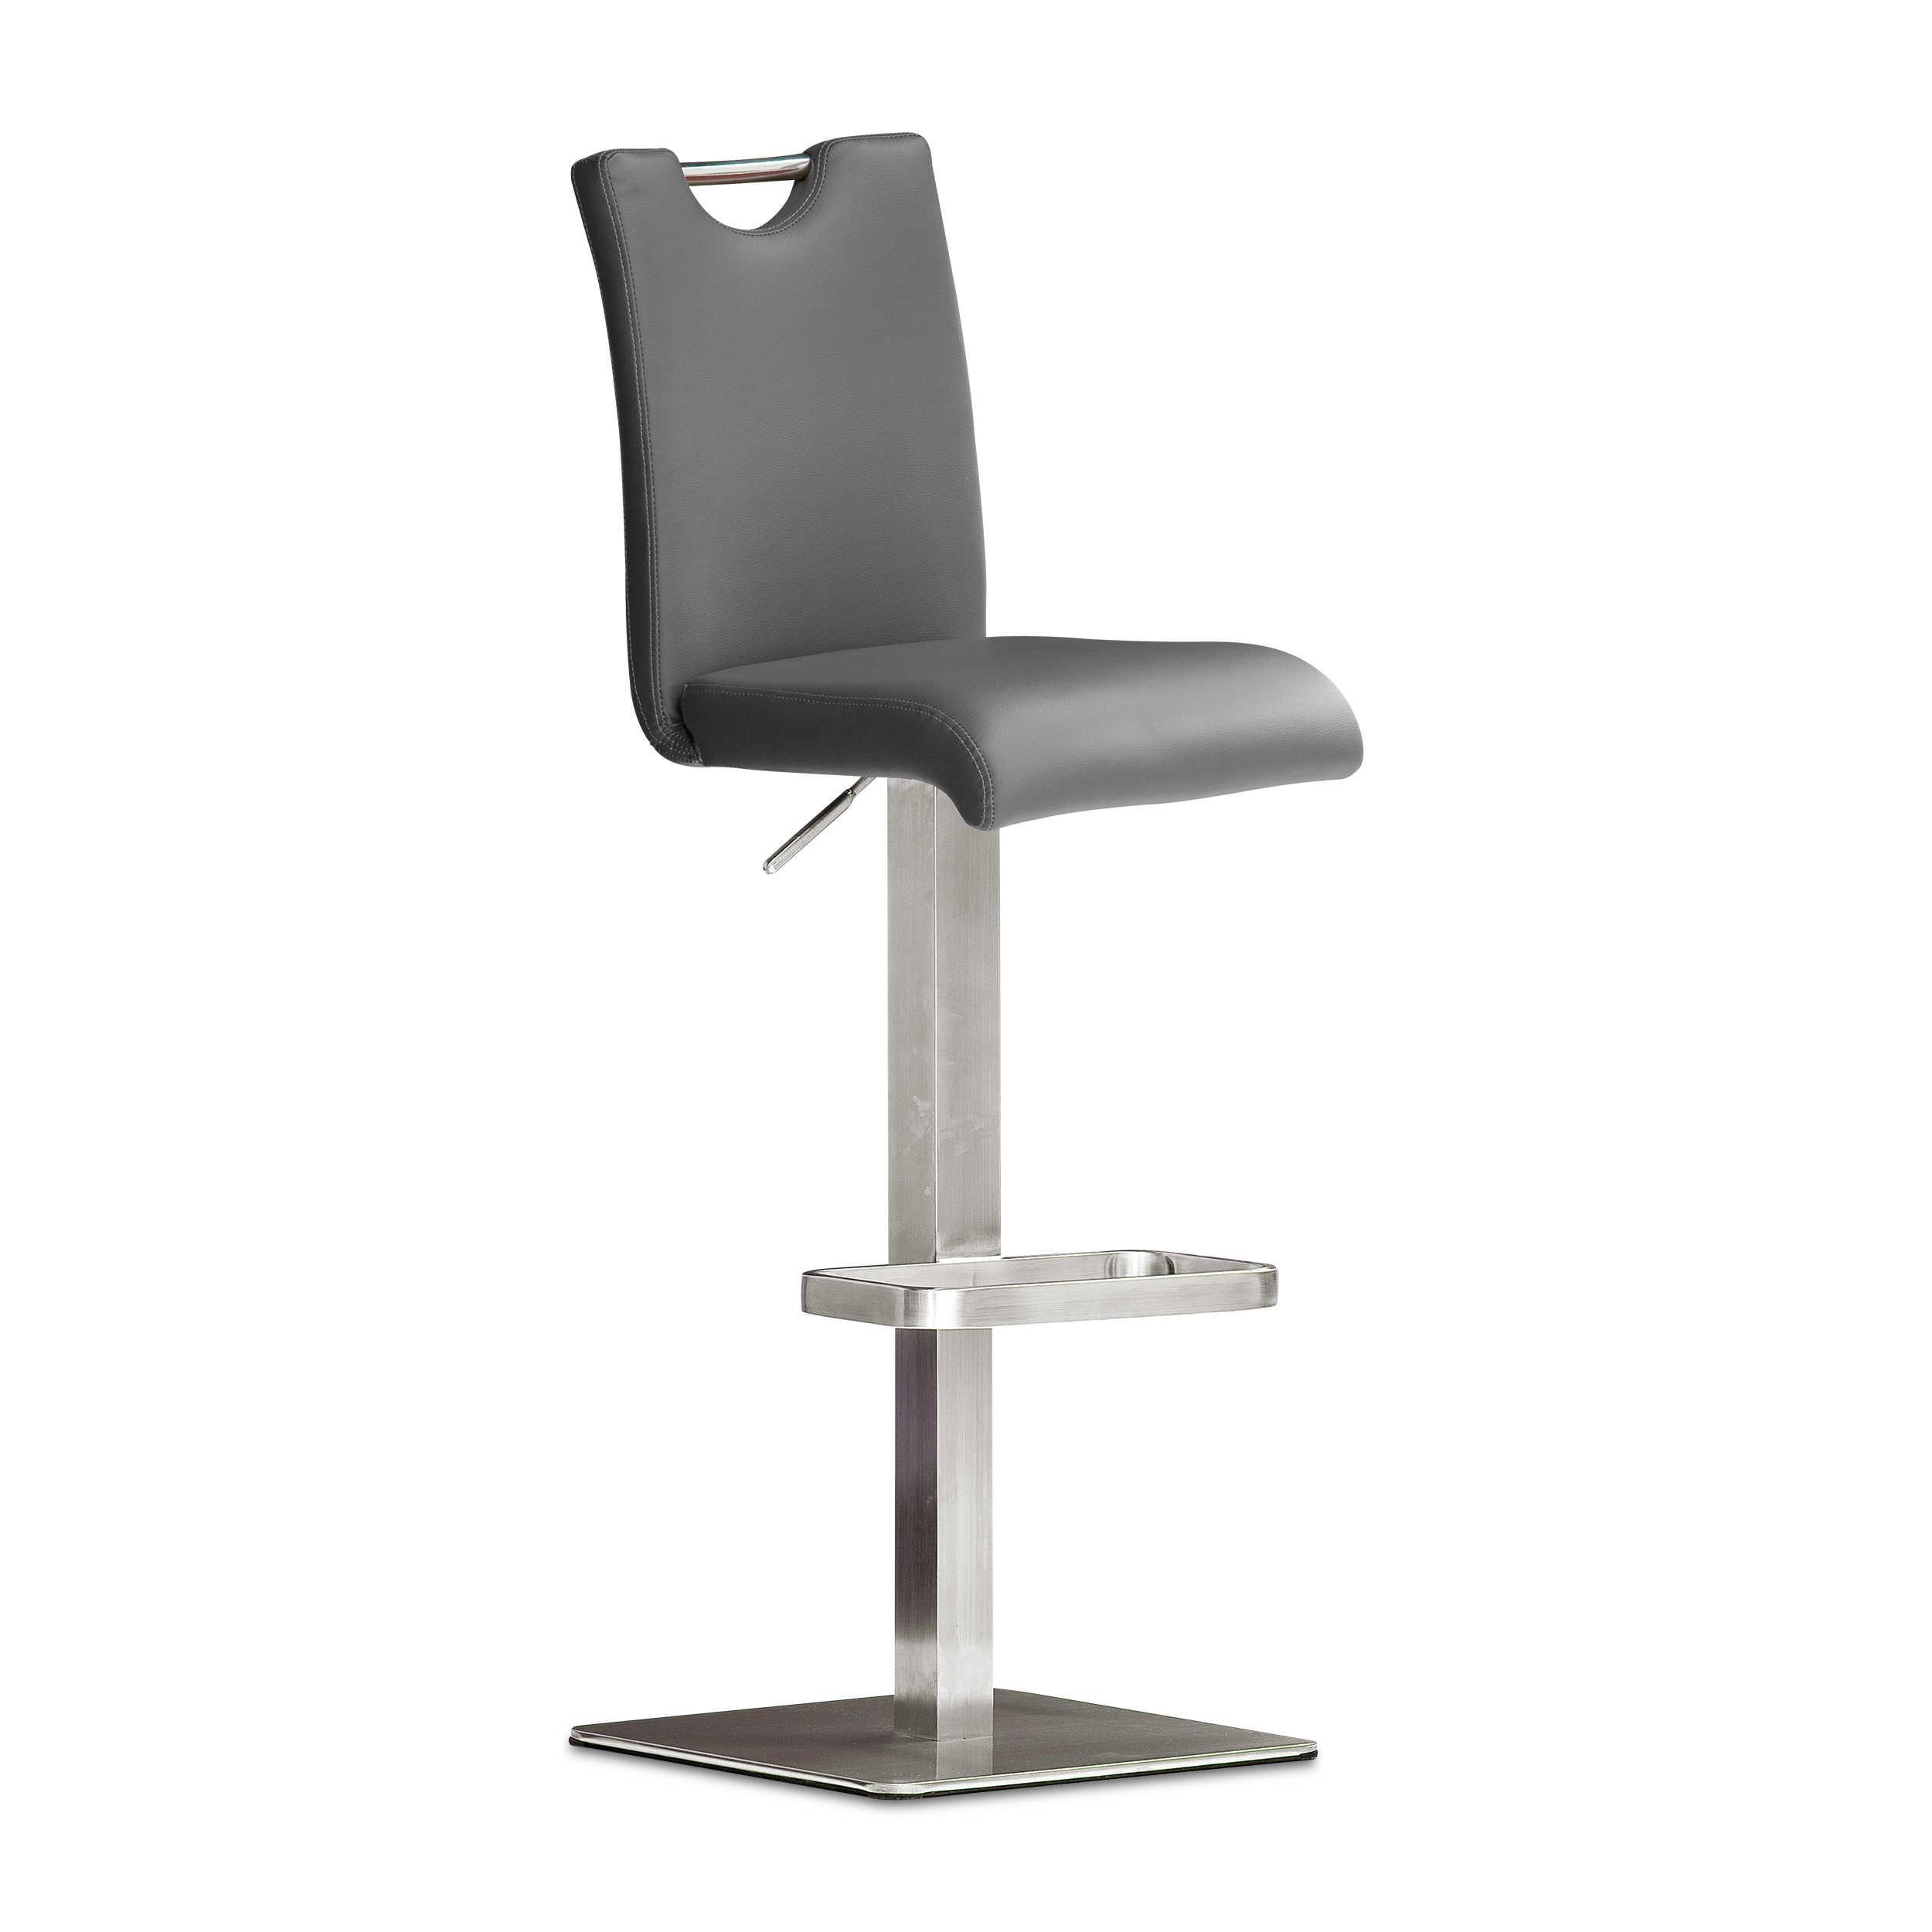 mca barhocker bardo grau lederoptik online kaufen bei woonio. Black Bedroom Furniture Sets. Home Design Ideas